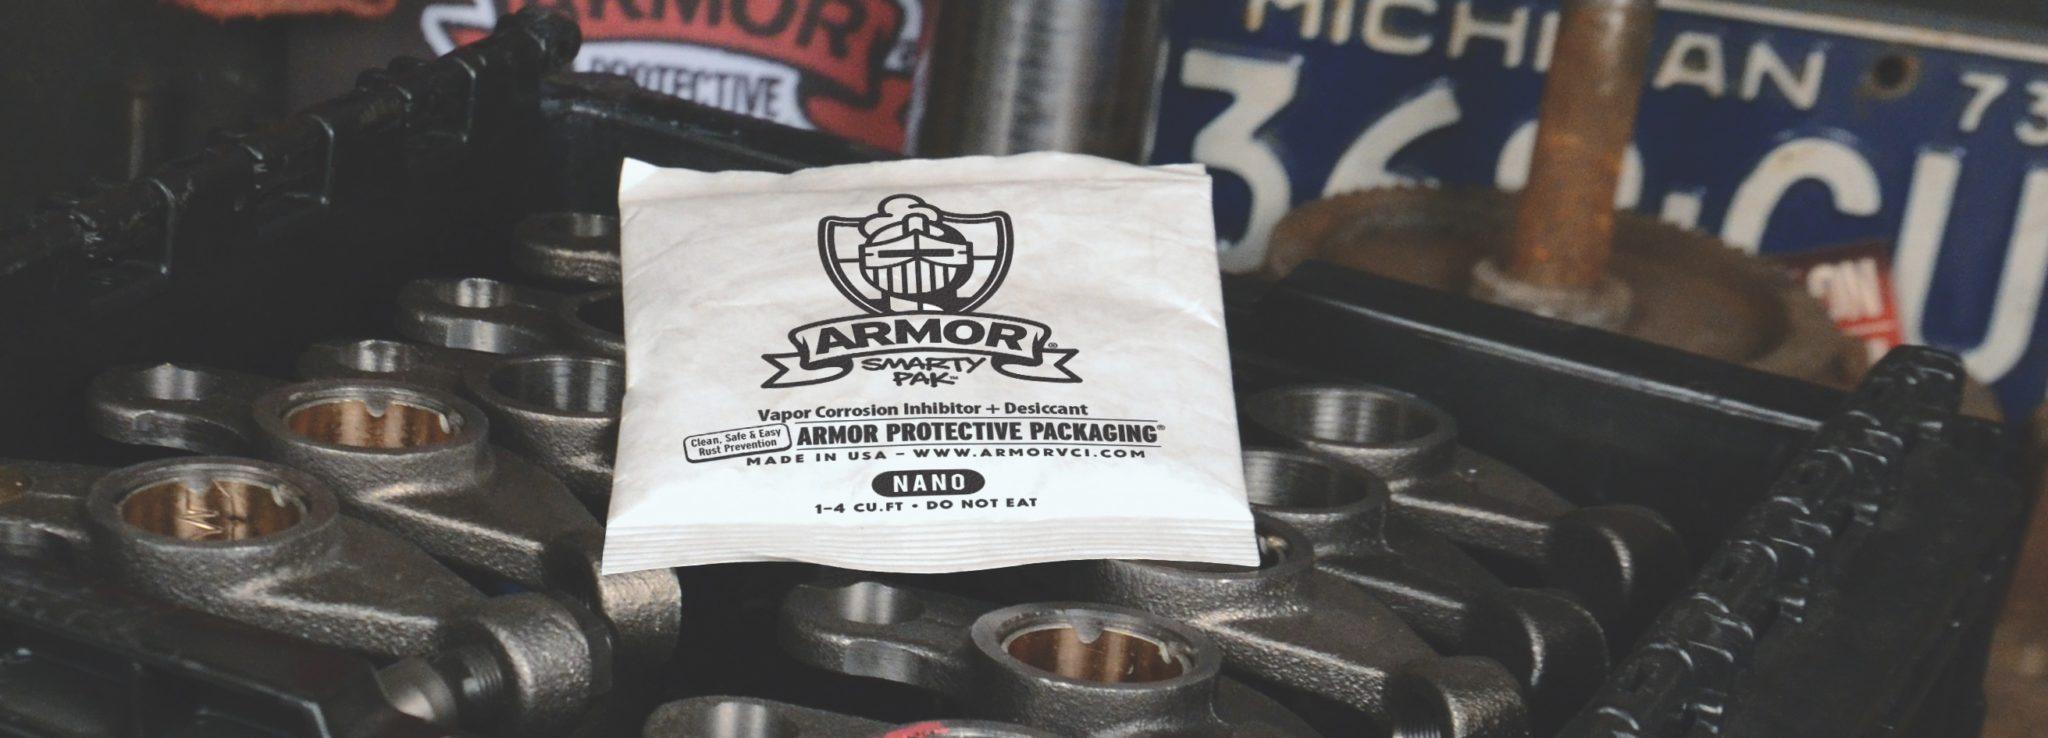 ARMOR SMARTY-PAK on Metal